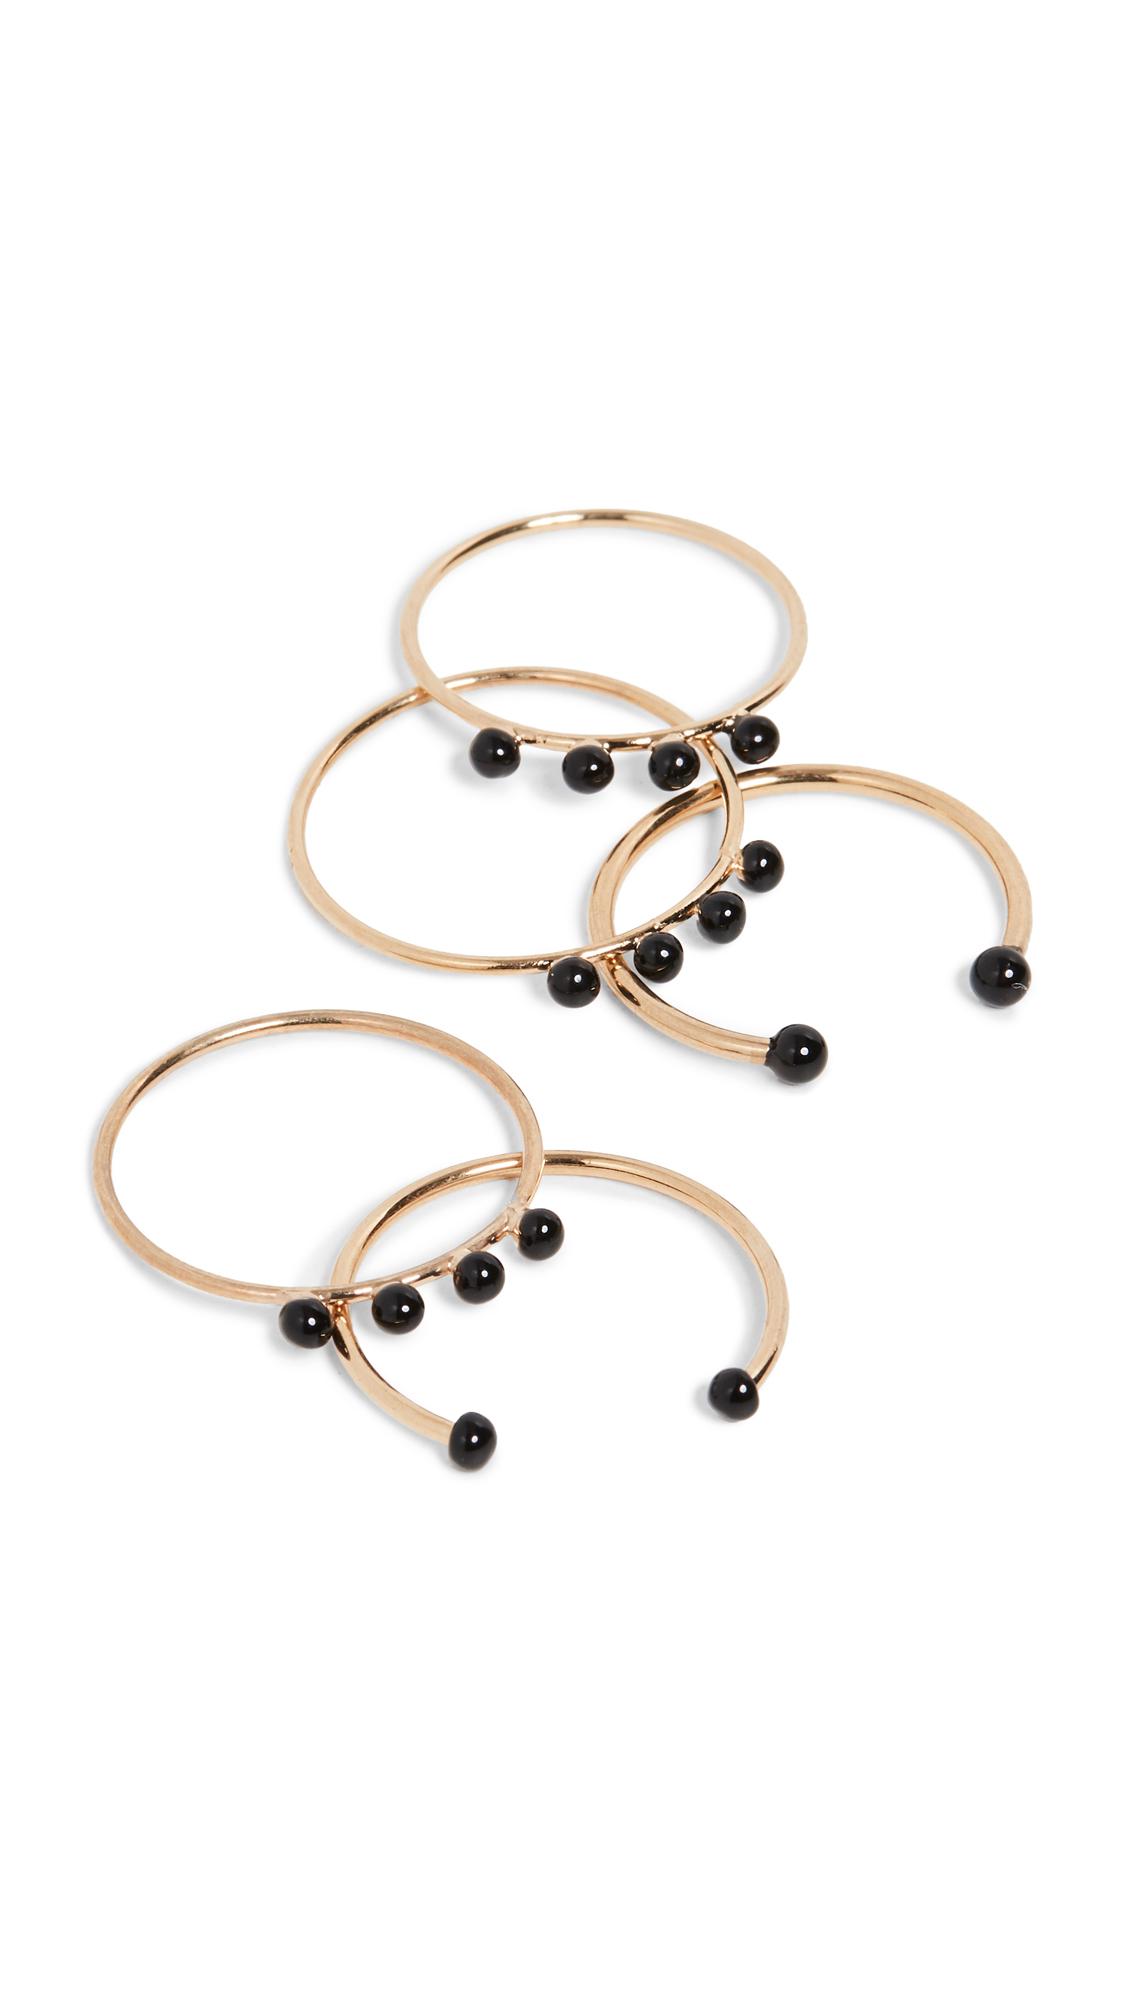 Isabel Marant Casablanca Stackable Ring Set